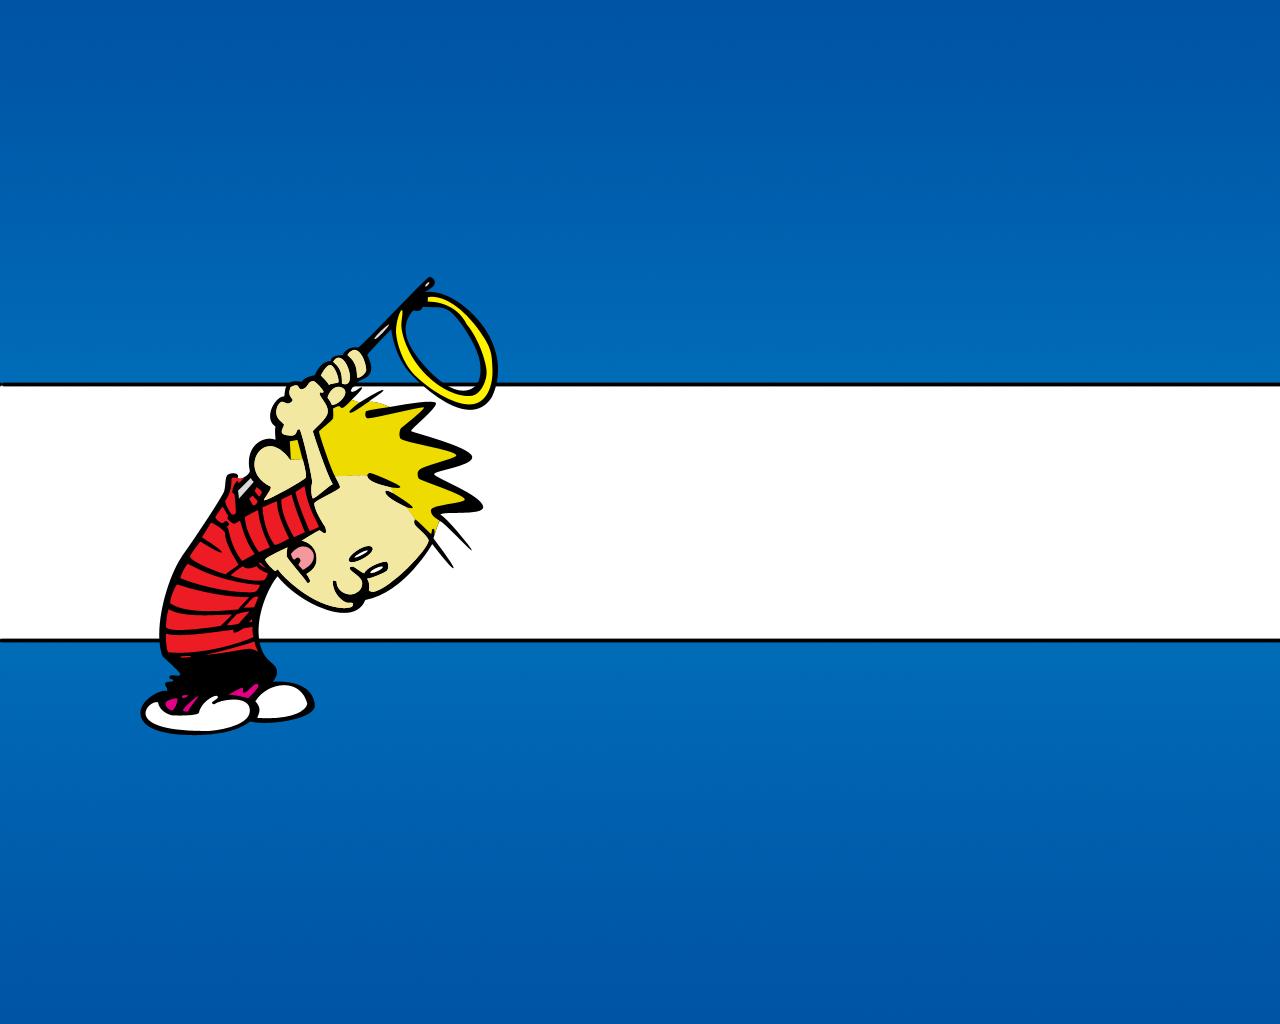 Calvin and Hobbes HD Cartoon Wallpapers| HD Wallpapers ...